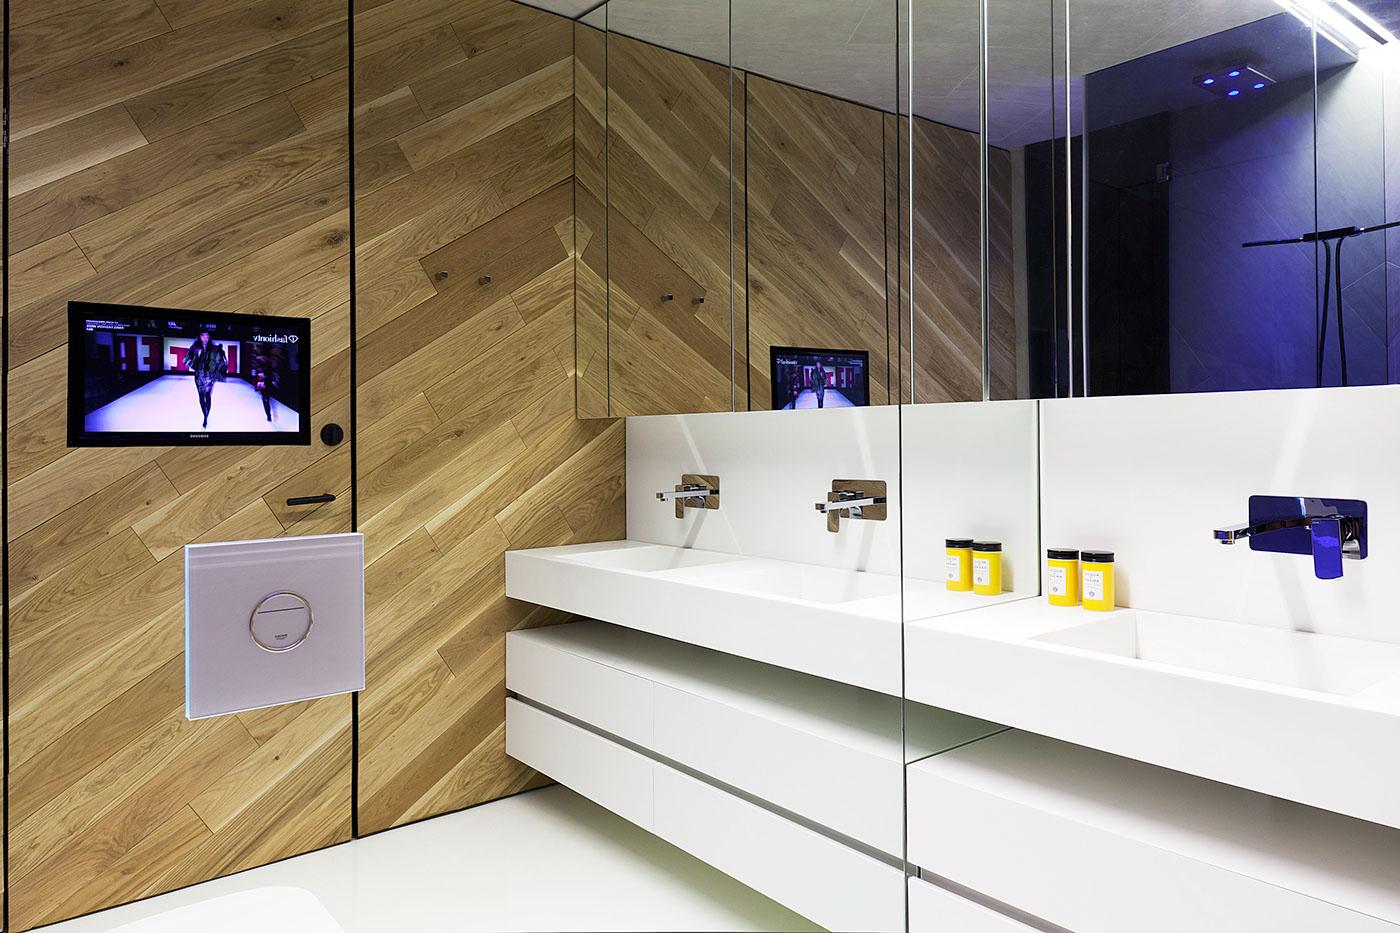 studio mode11 Loft Apartment By Studio Mode